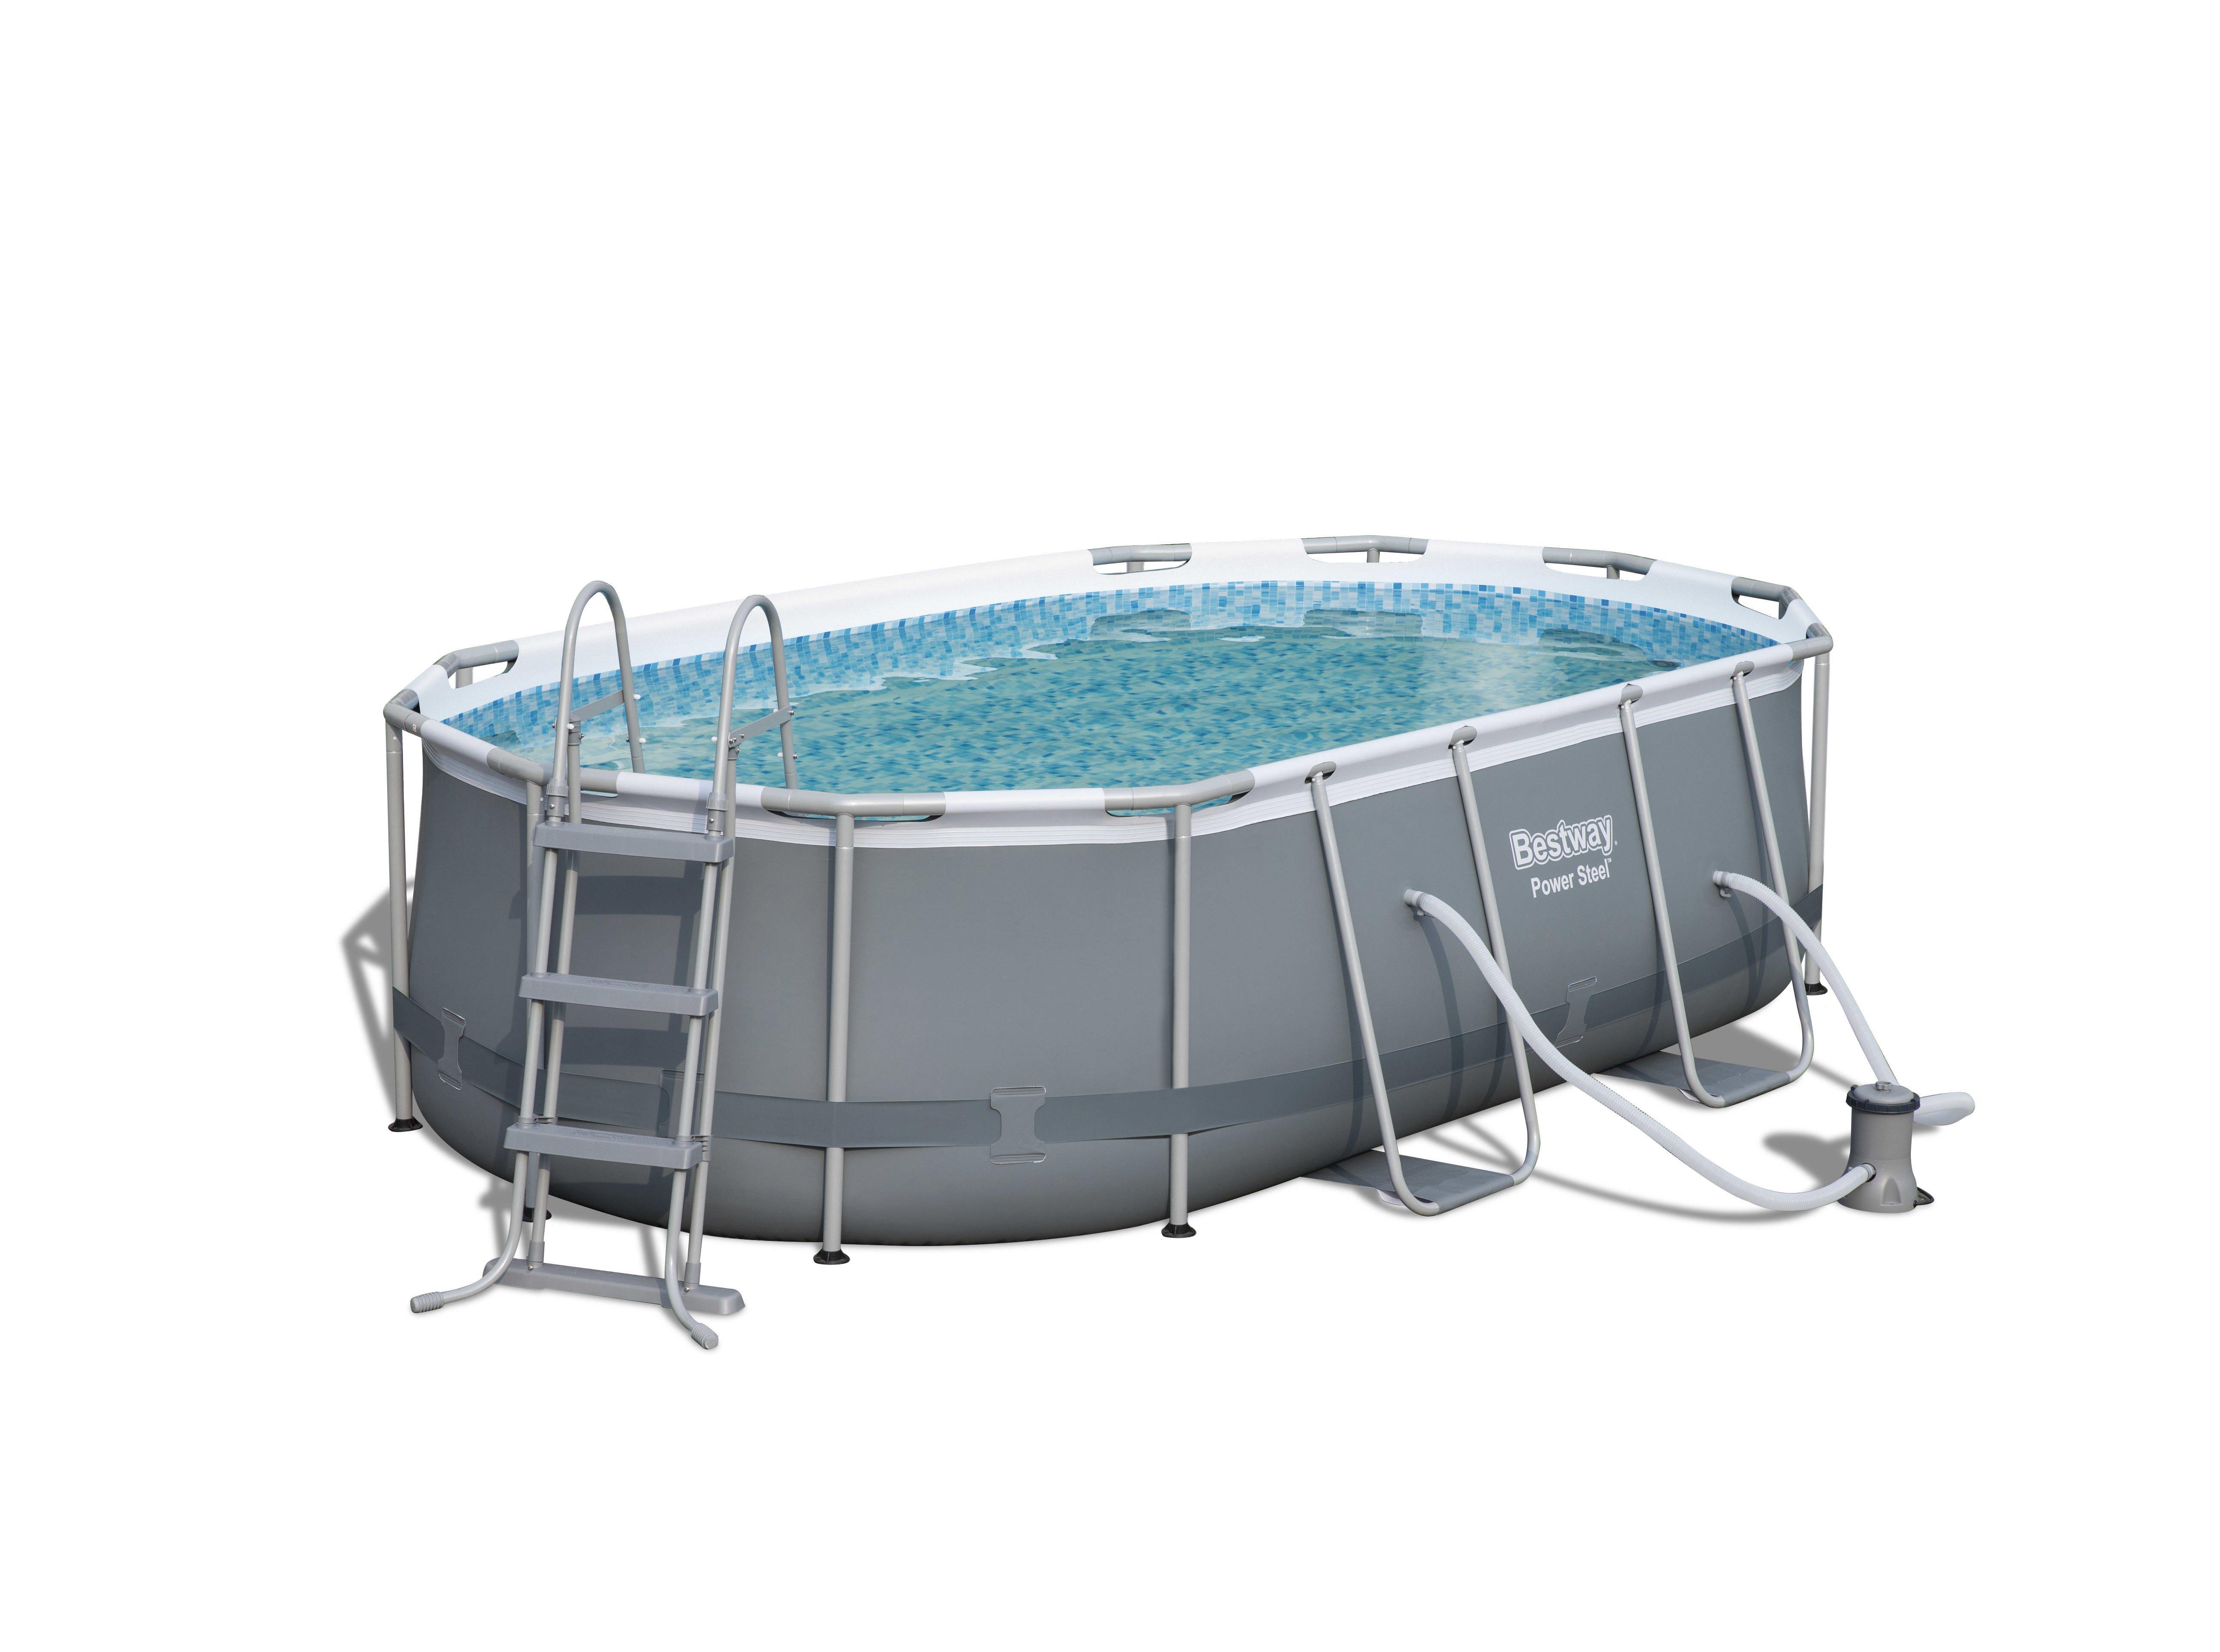 accessoire piscine tubulaire bestway. Black Bedroom Furniture Sets. Home Design Ideas